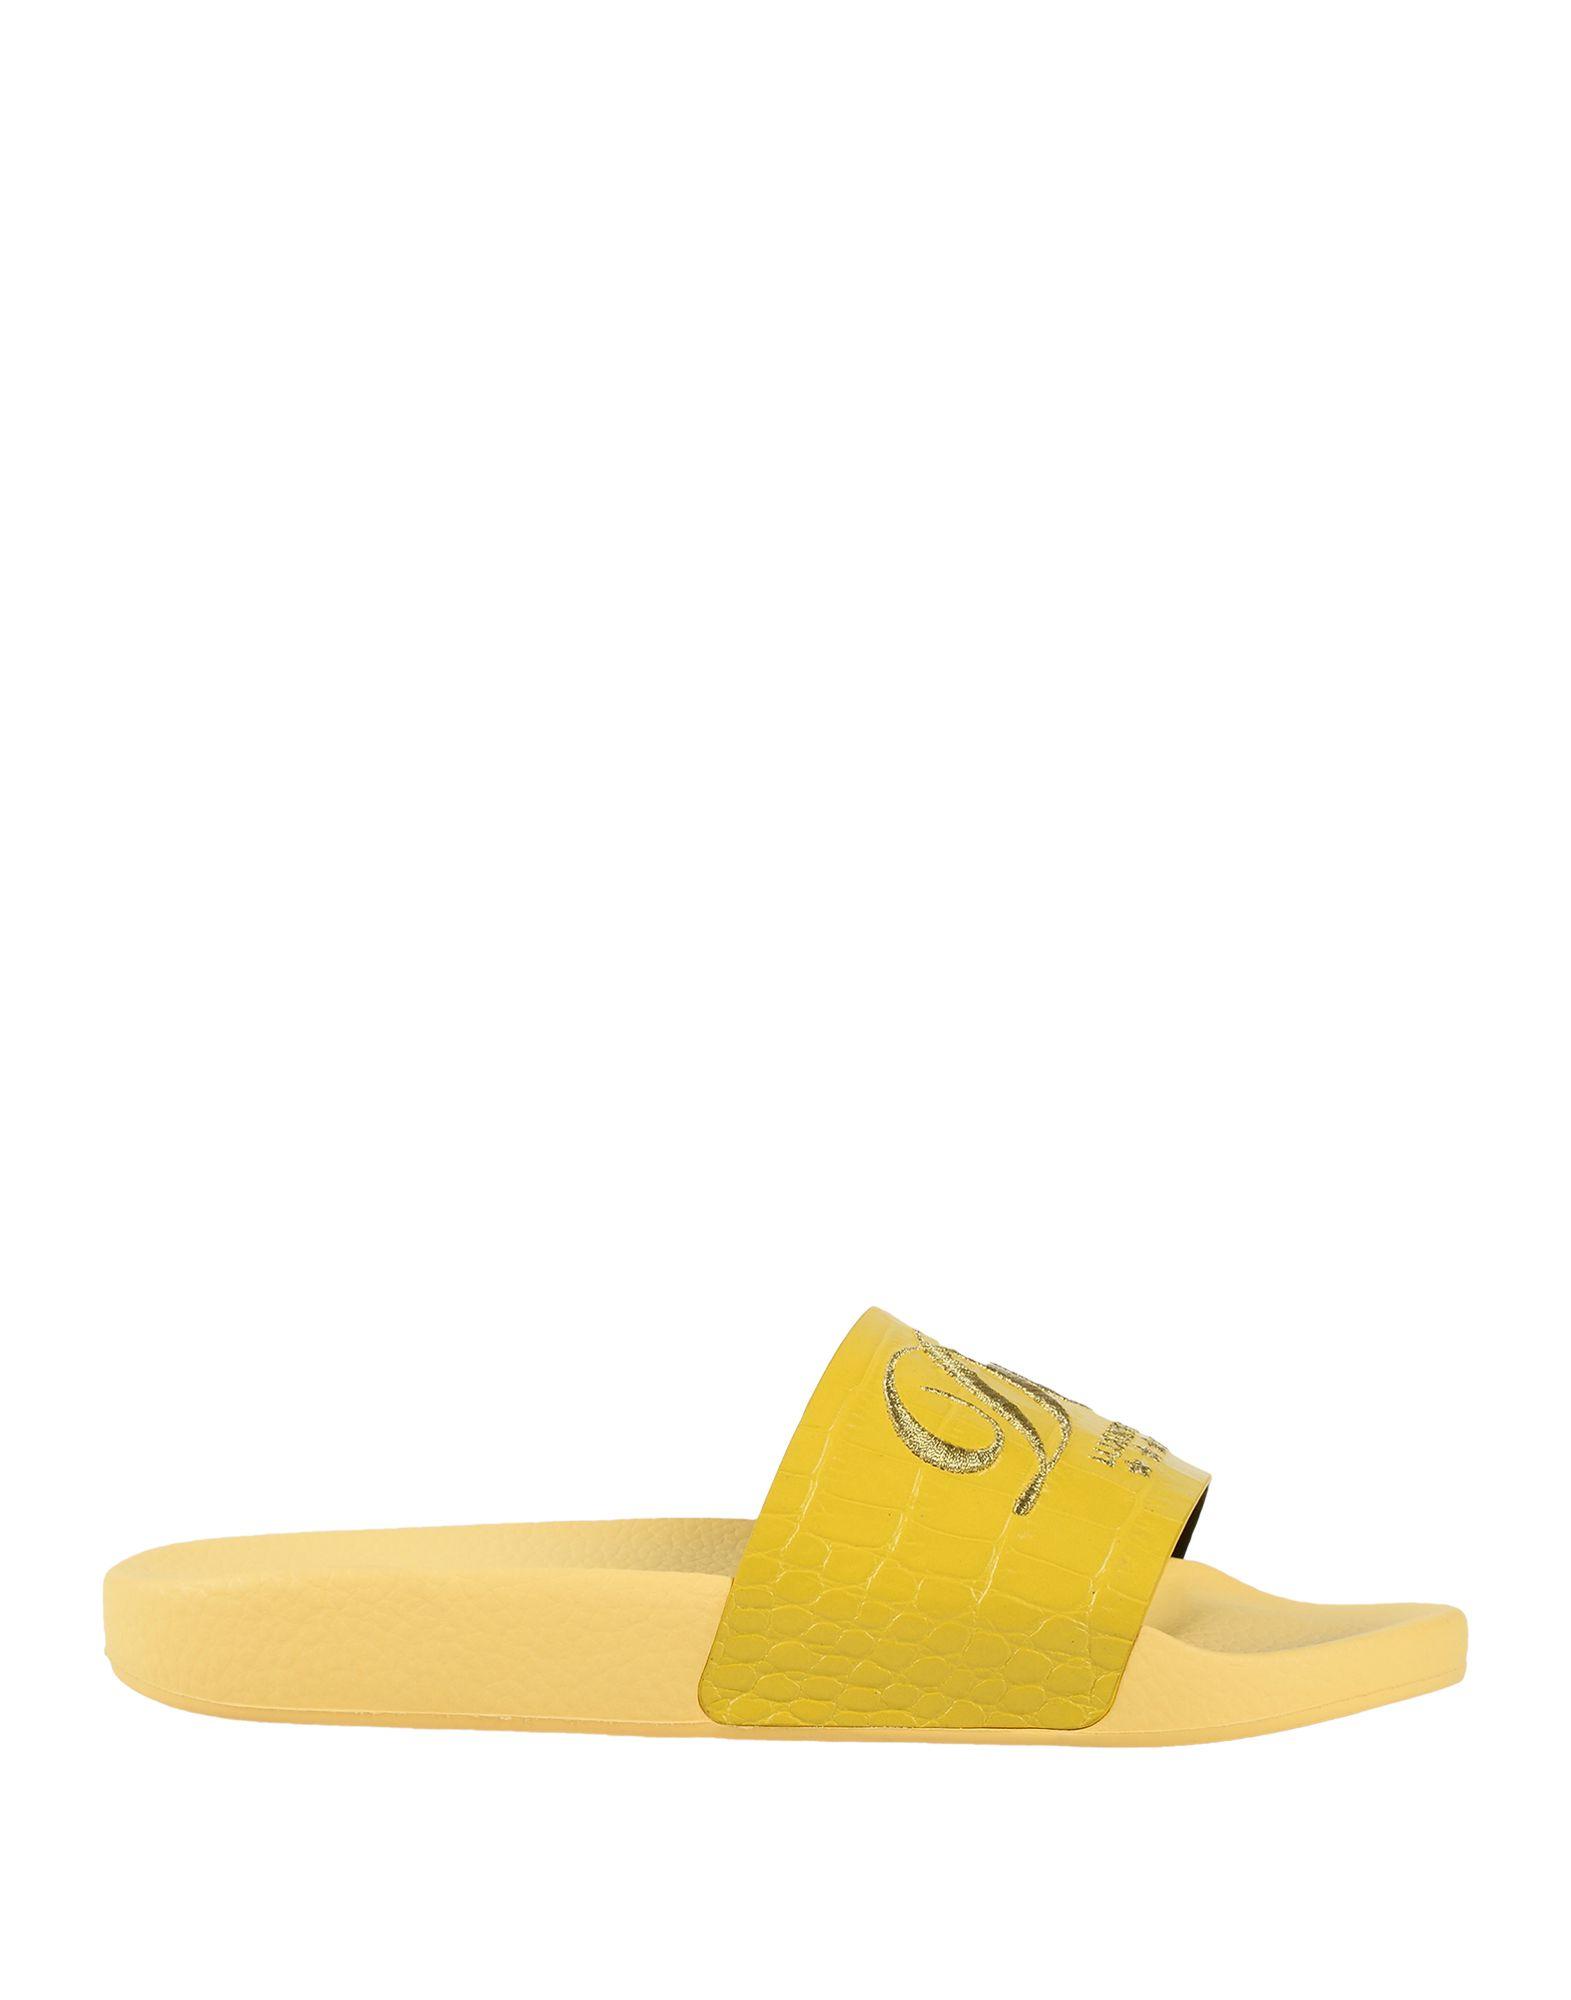 DOLCE & GABBANA Домашние туфли flip flop домашние туфли